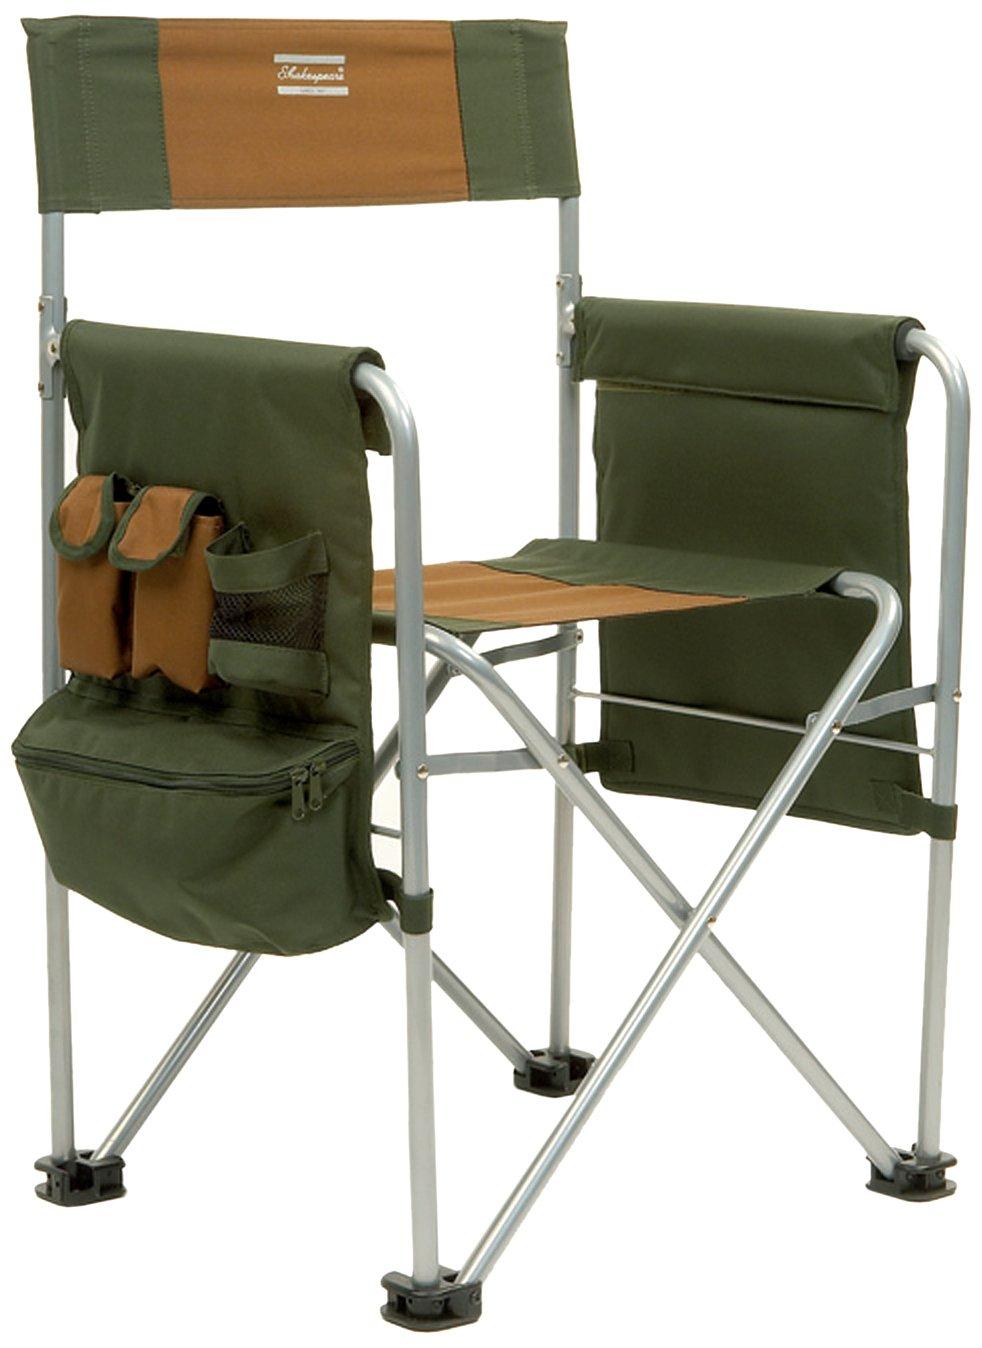 shakespeare directors chair chaise de p che marron vert. Black Bedroom Furniture Sets. Home Design Ideas